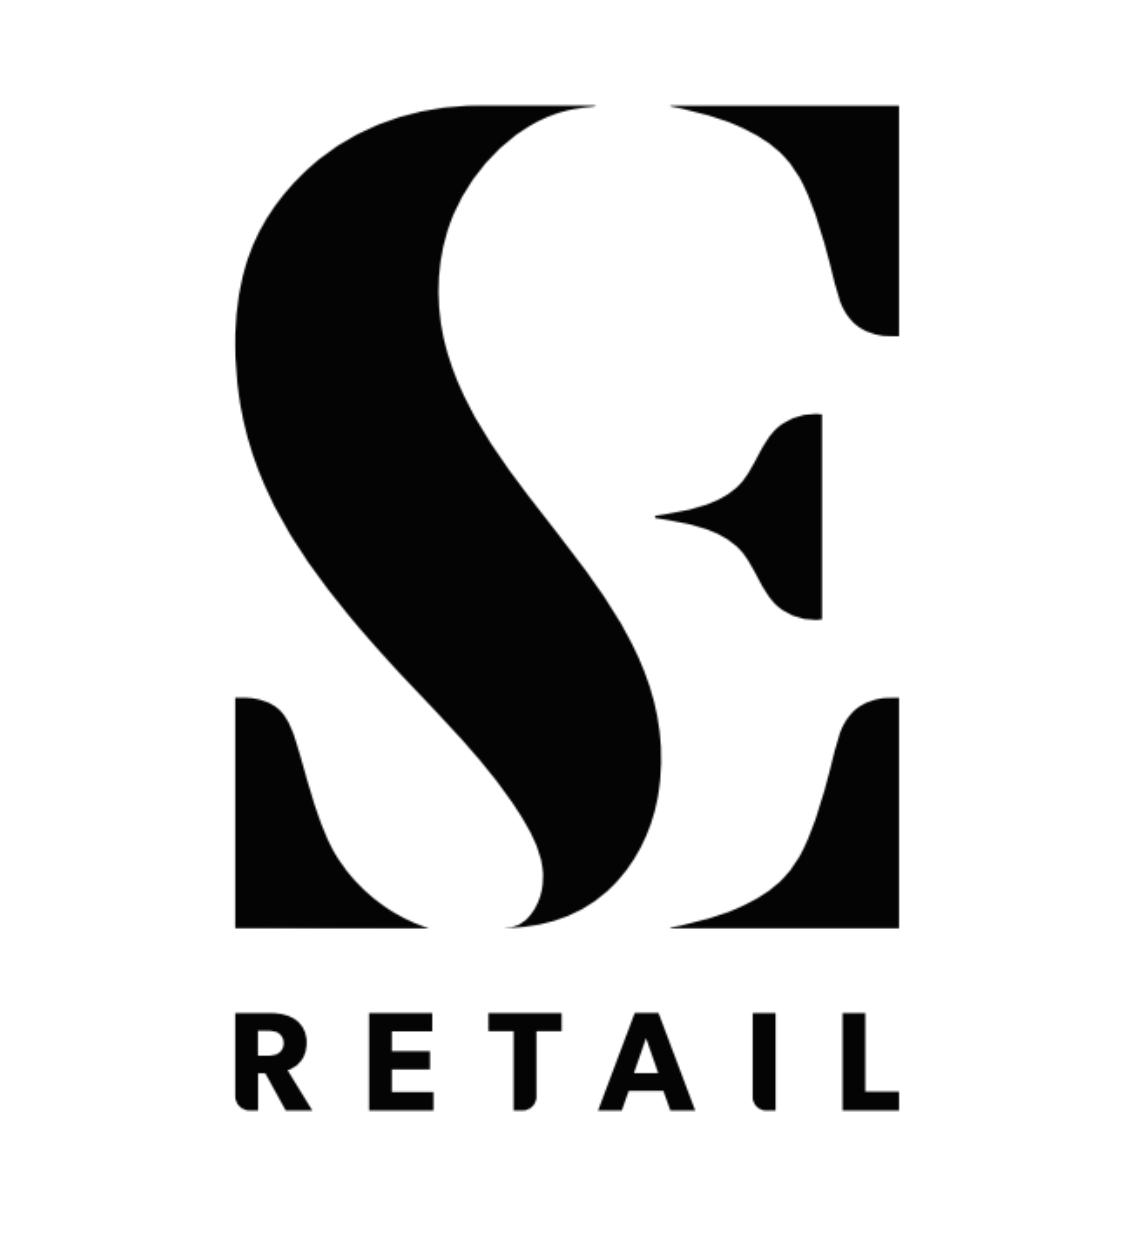 SE Retail logo